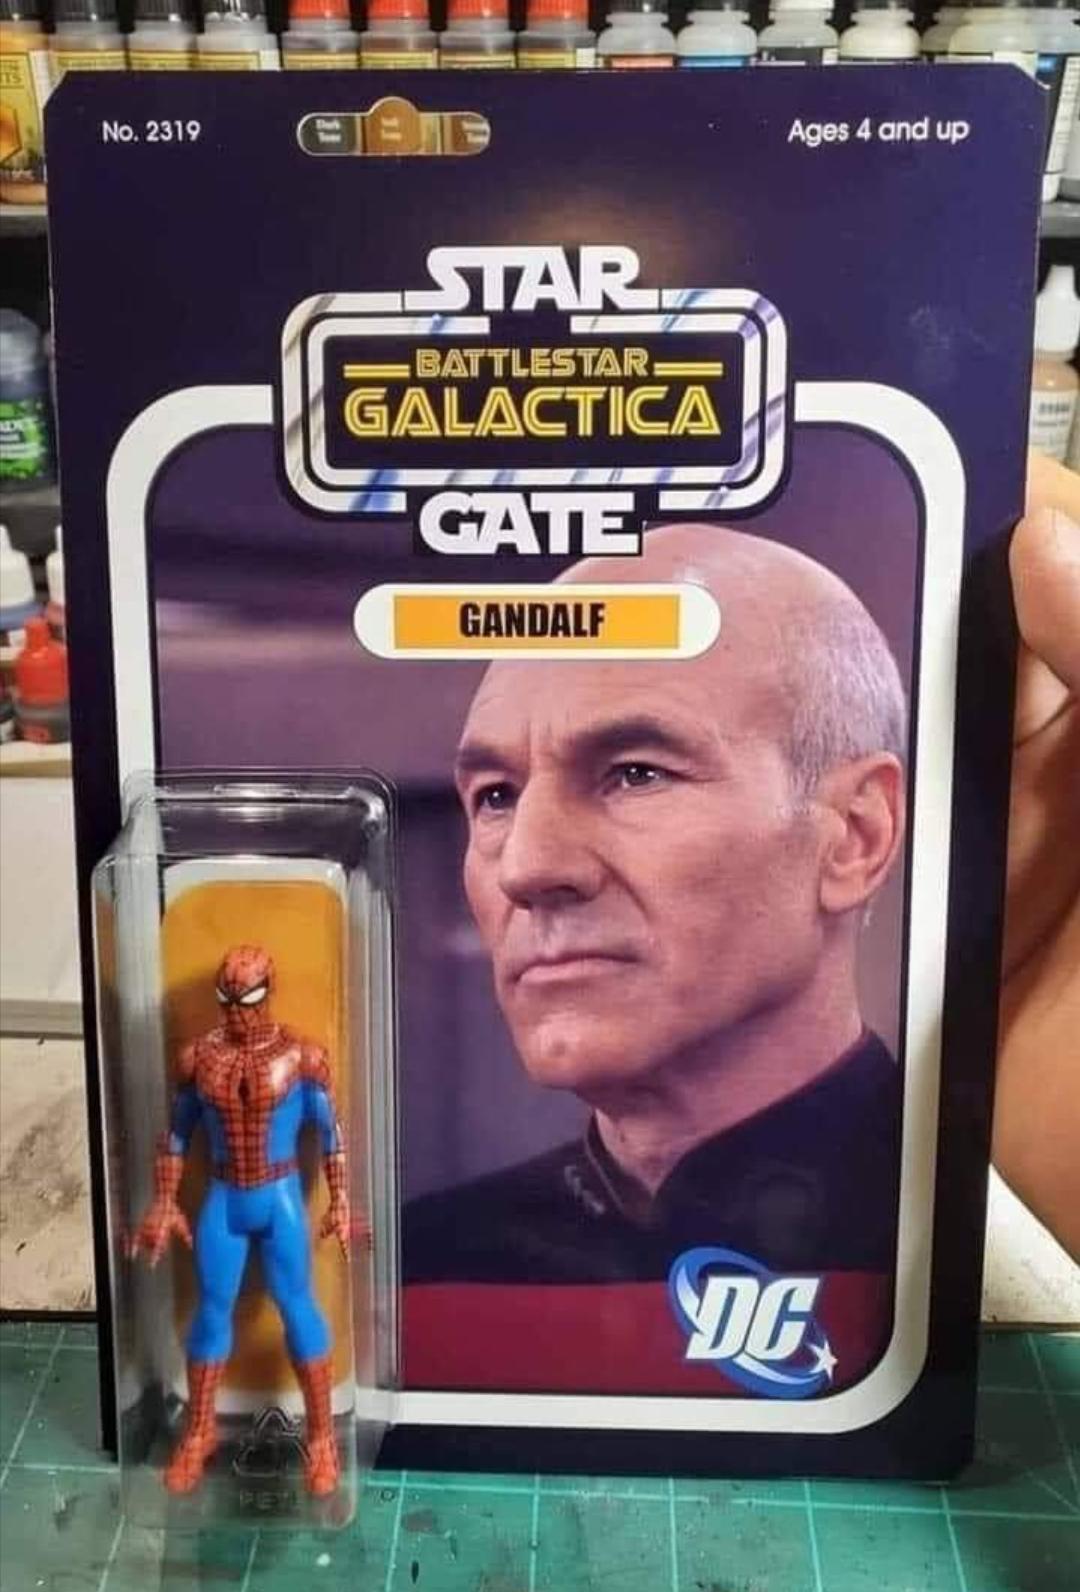 Star Battlestar Galactica Gate Gandalf